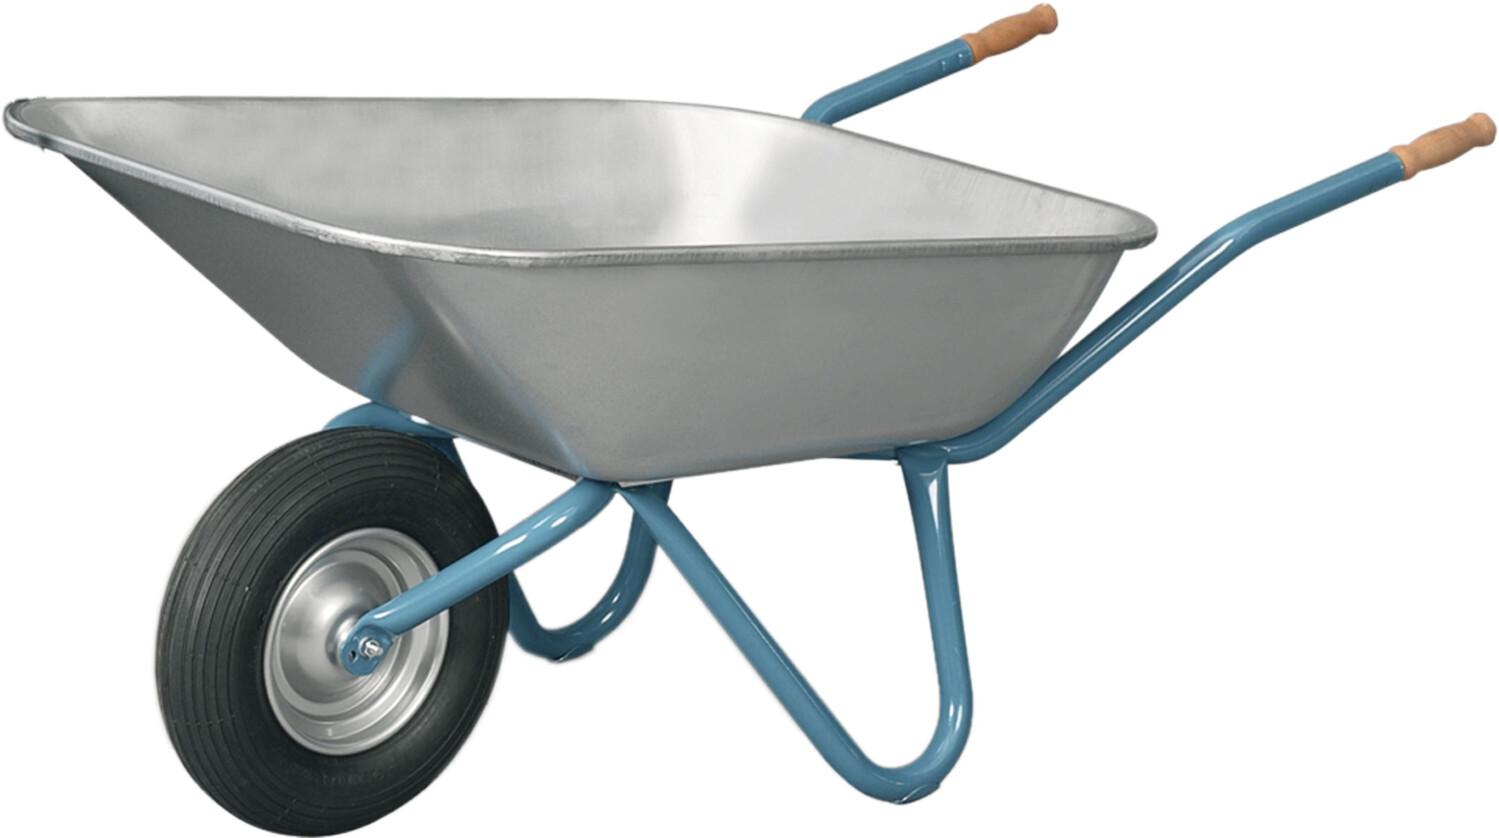 Schubkarre Export 100 Liter  mit doppeltem Boden